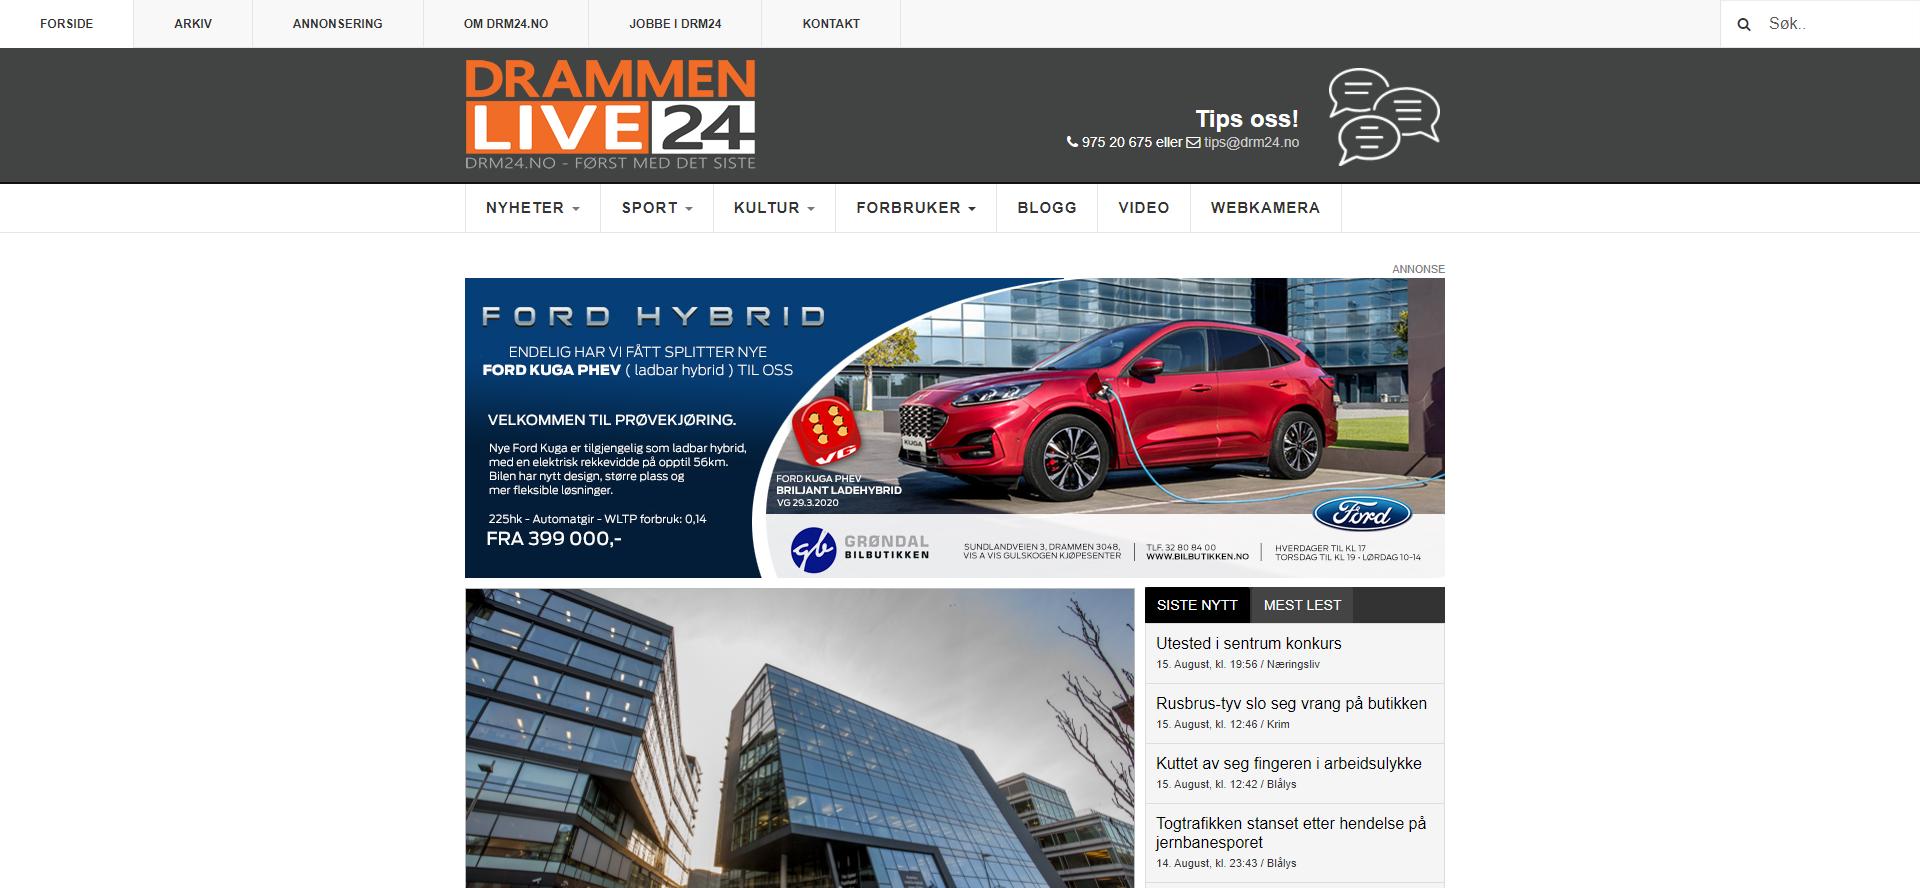 Drammen Live24 AS